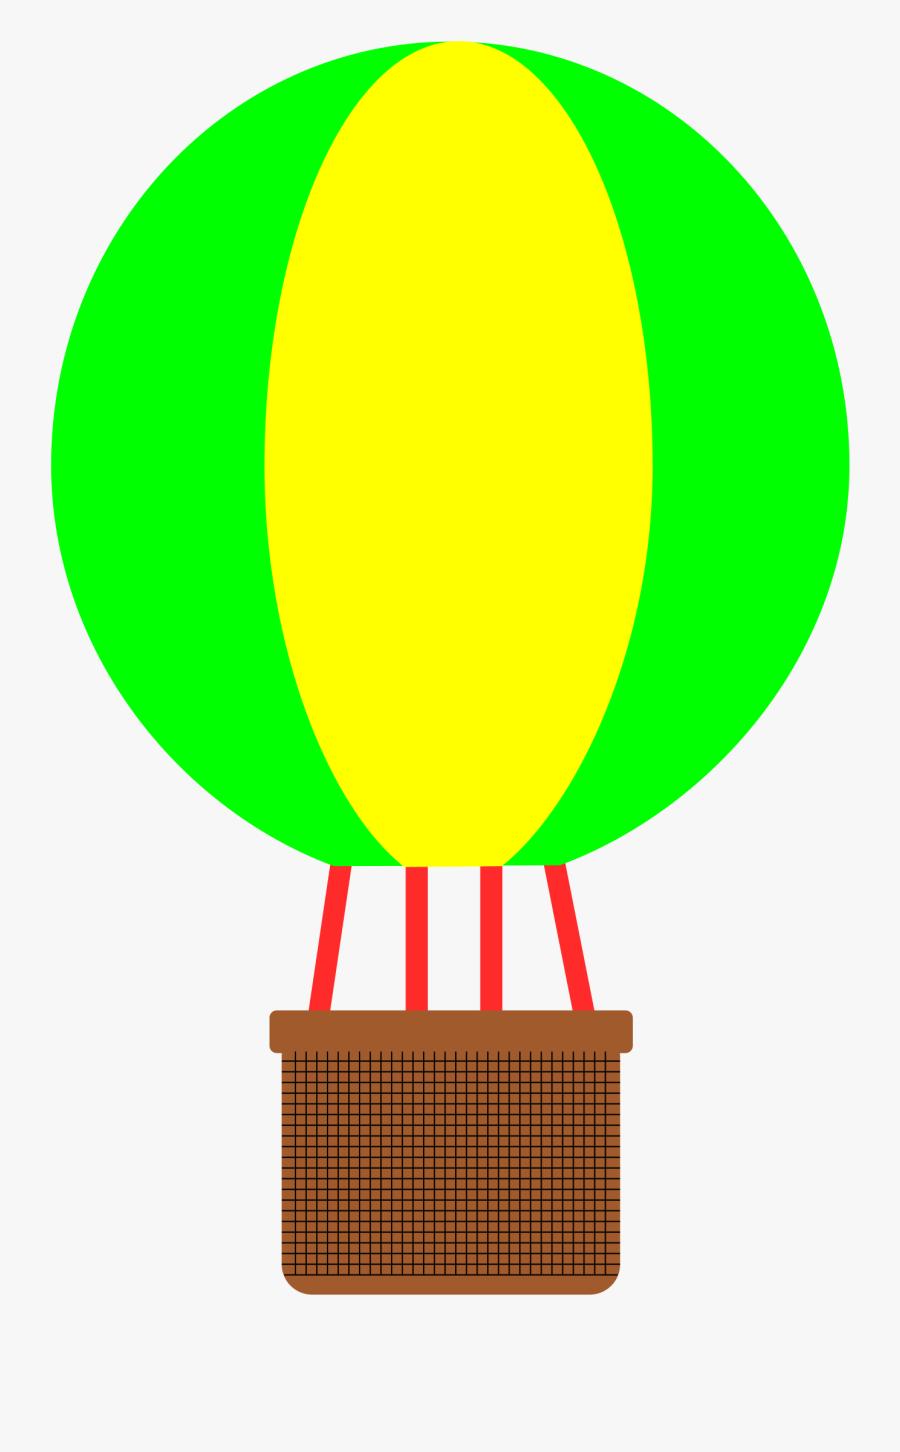 Free Hot Air Agomjo - Hot Air Balloon Basket Clipart, Transparent Clipart